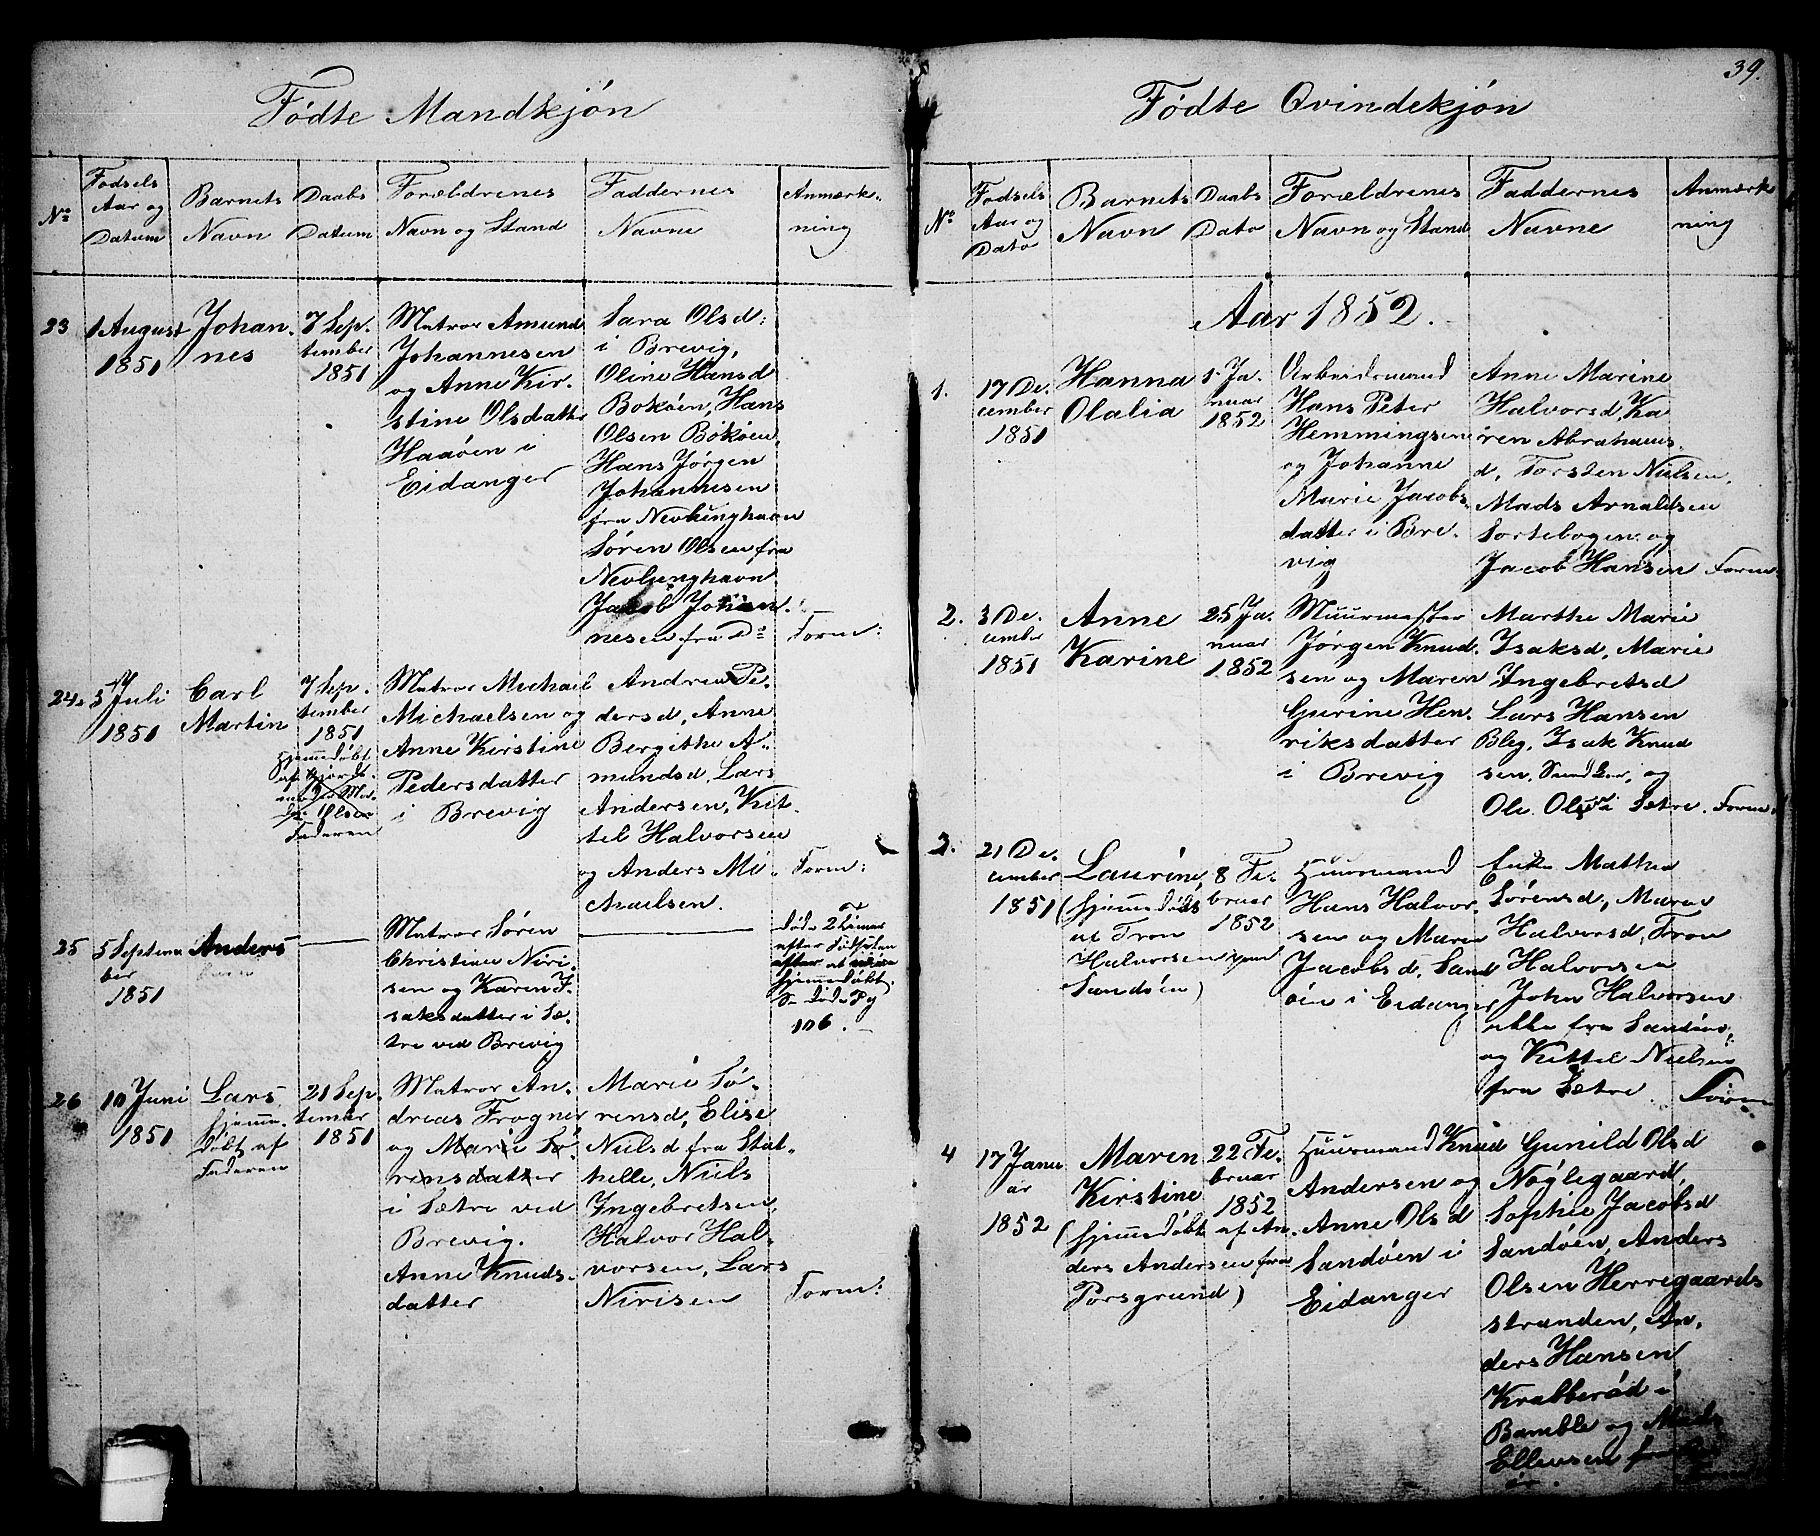 SAKO, Brevik kirkebøker, G/Ga/L0002: Klokkerbok nr. 2, 1846-1865, s. 39